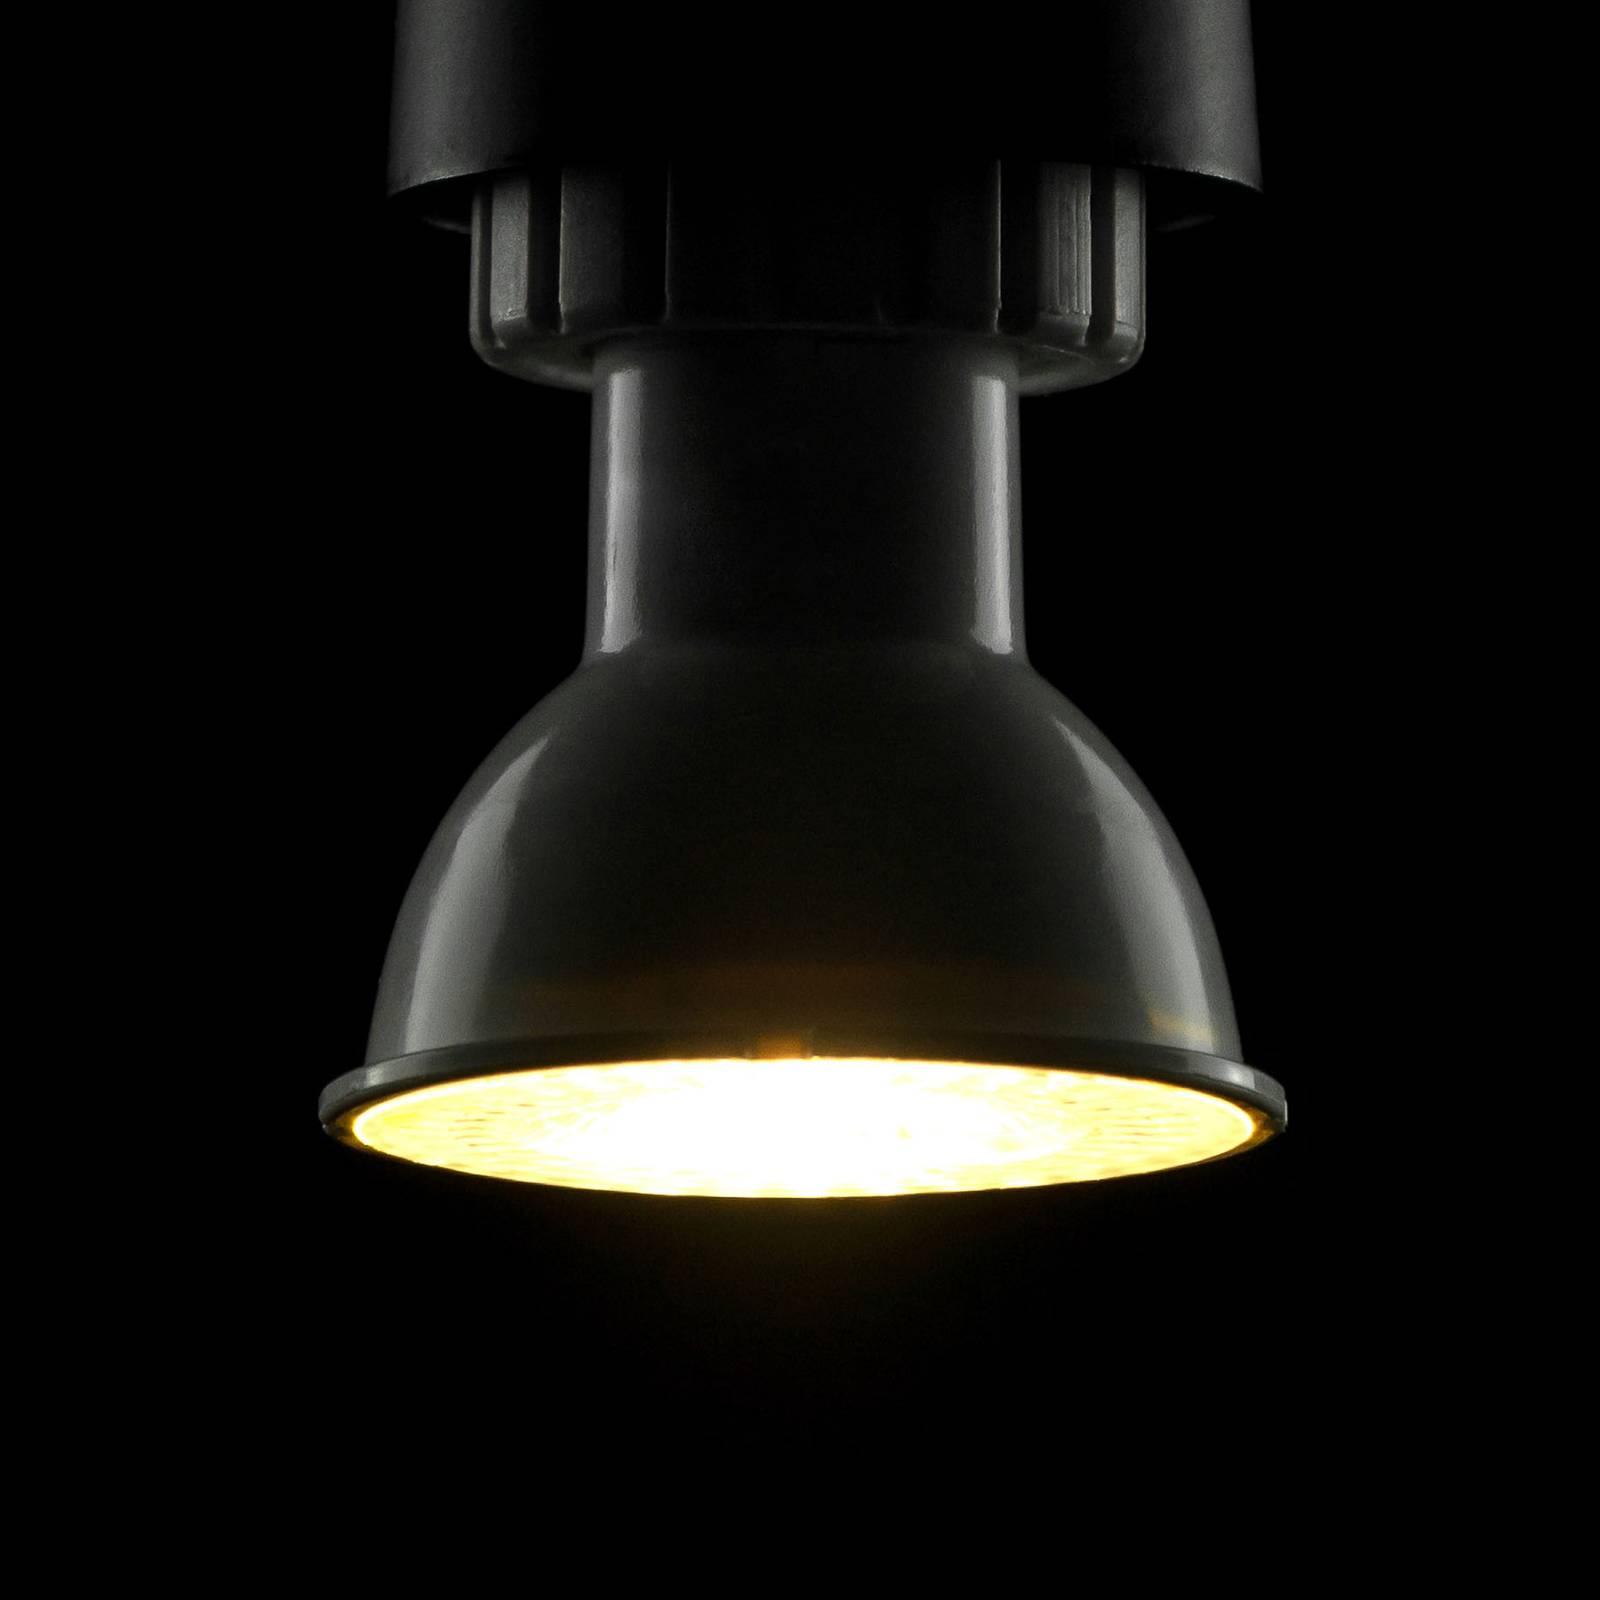 SEGULA reflector LED bulb GU10 6W 3,000K dim 35°